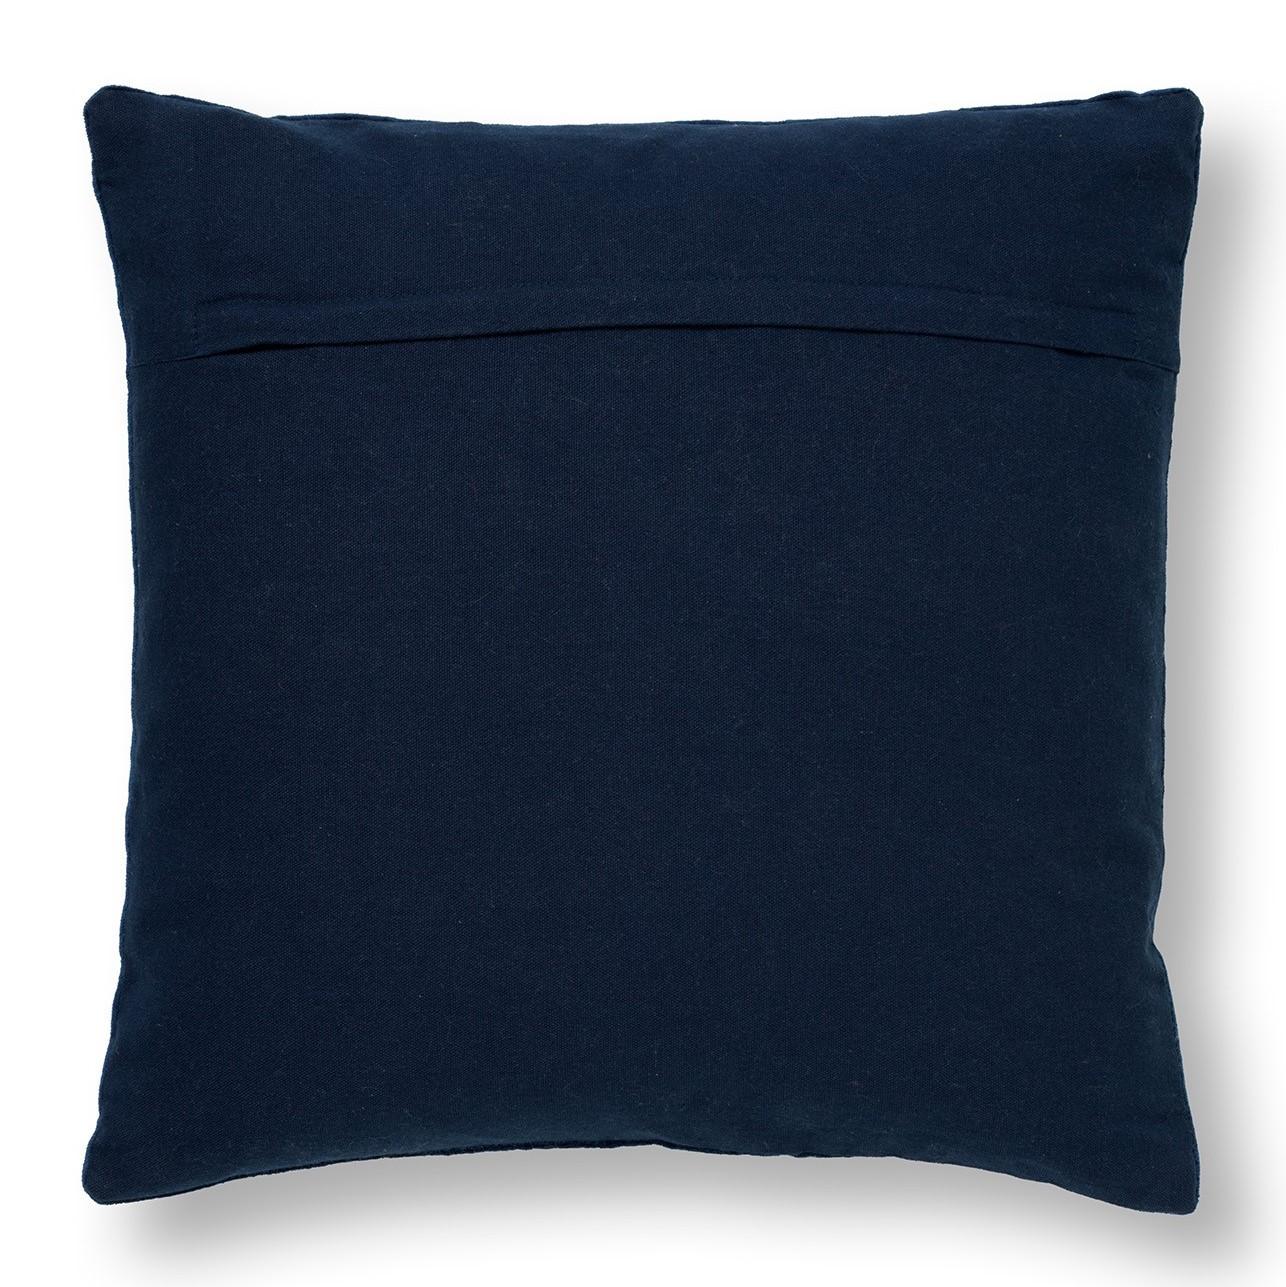 REMY - Sierkussen velvet Insignia Blue 45x45 cm